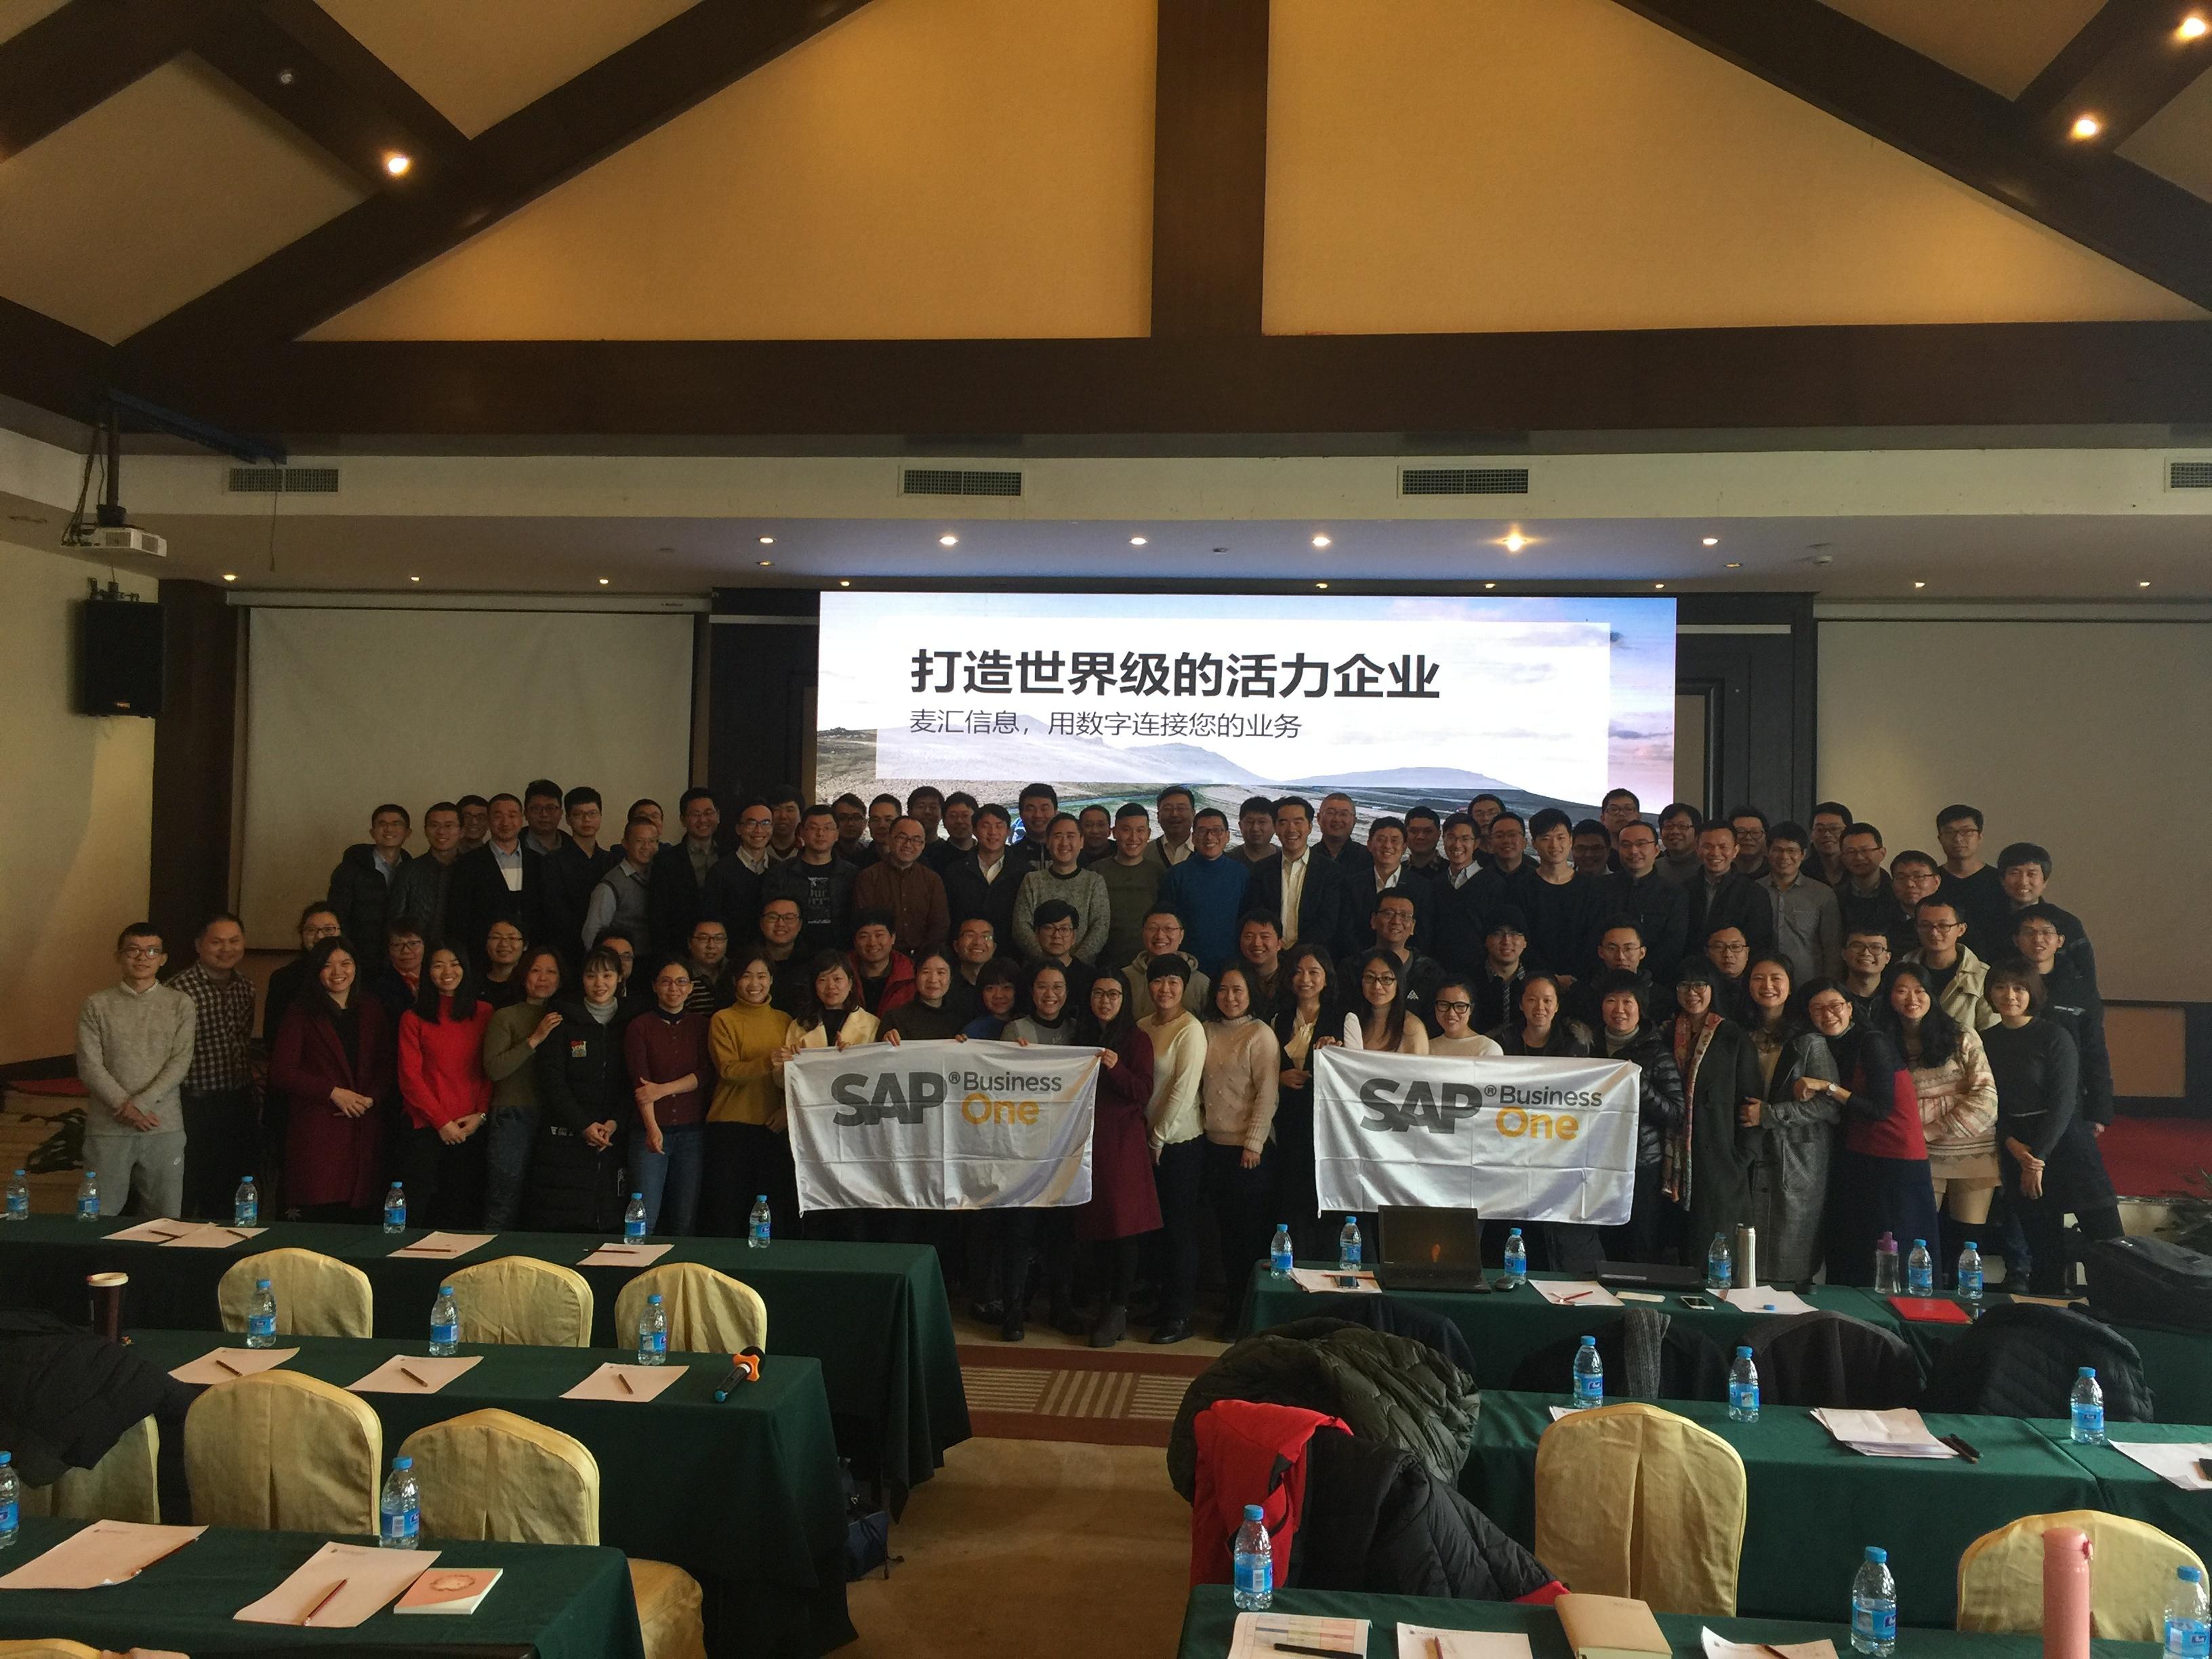 MTC Annual Meeting in 2018